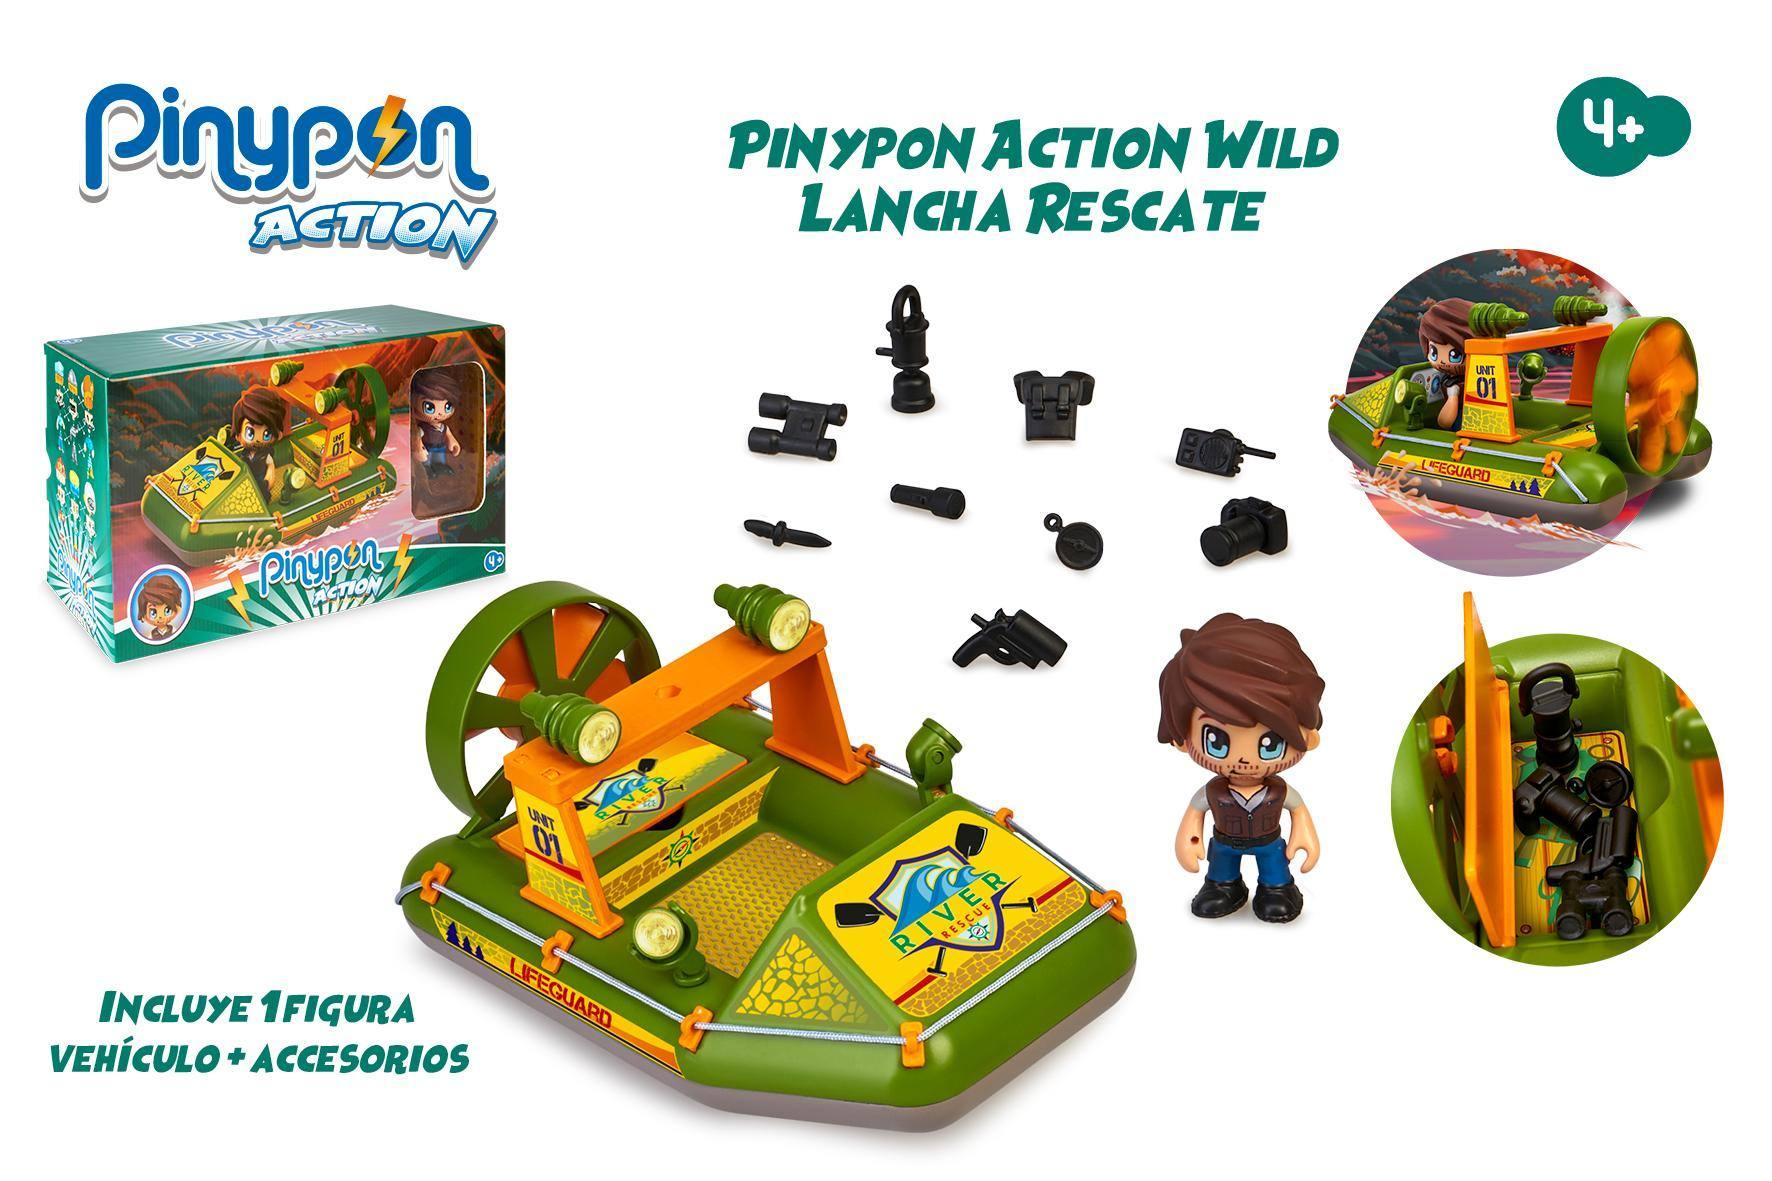 PINYPON ACCION LANCHA RESCATE 16340